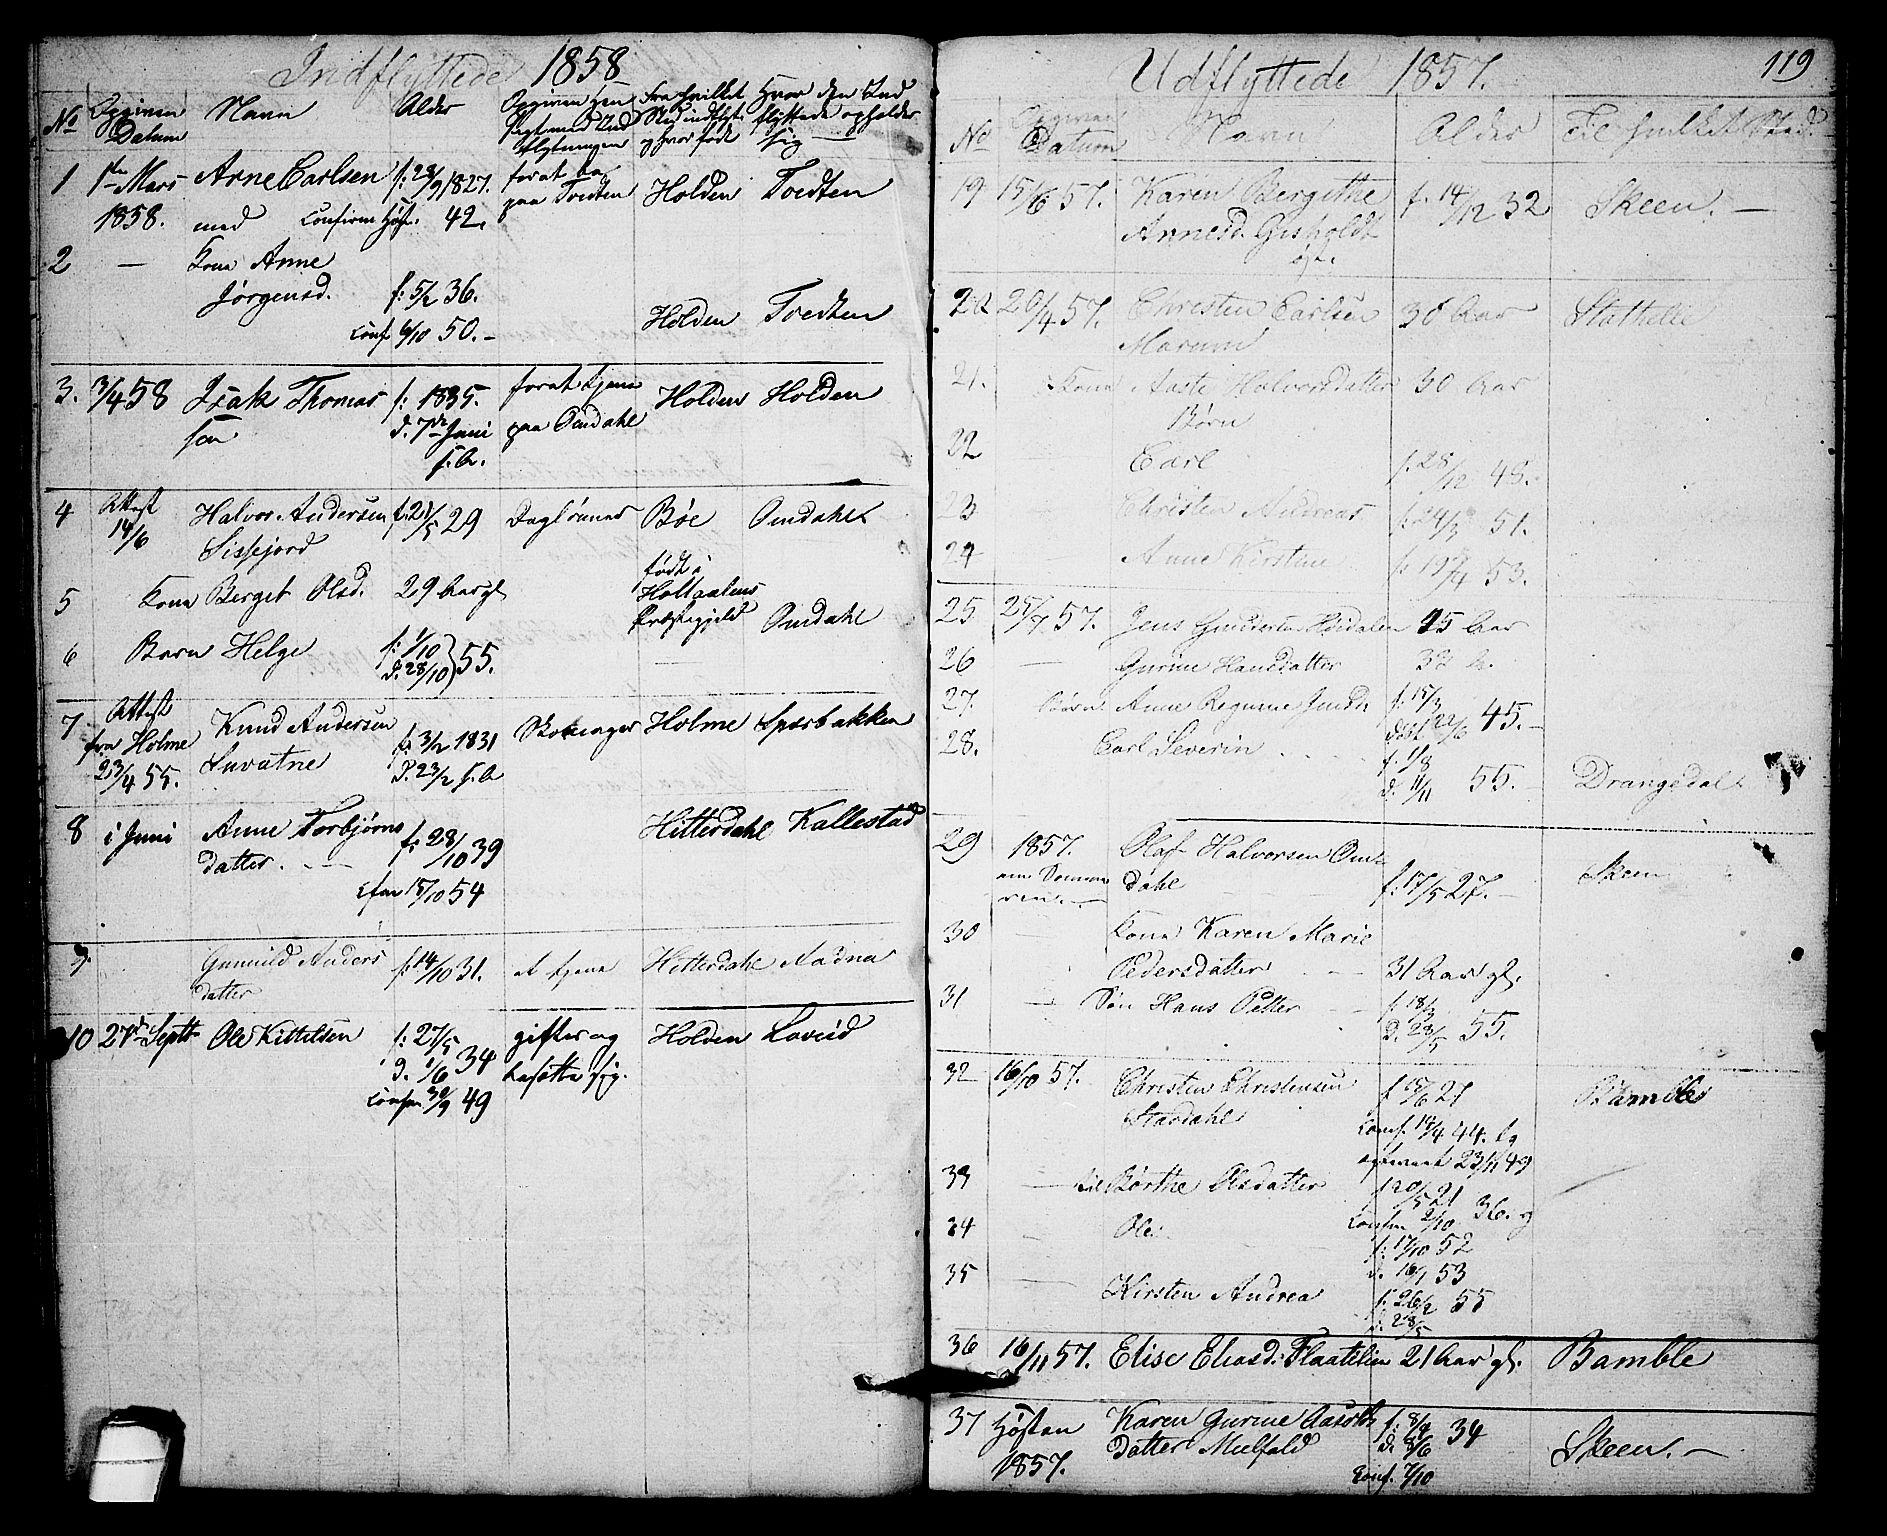 SAKO, Solum kirkebøker, G/Gb/L0001: Klokkerbok nr. II 1, 1848-1859, s. 119